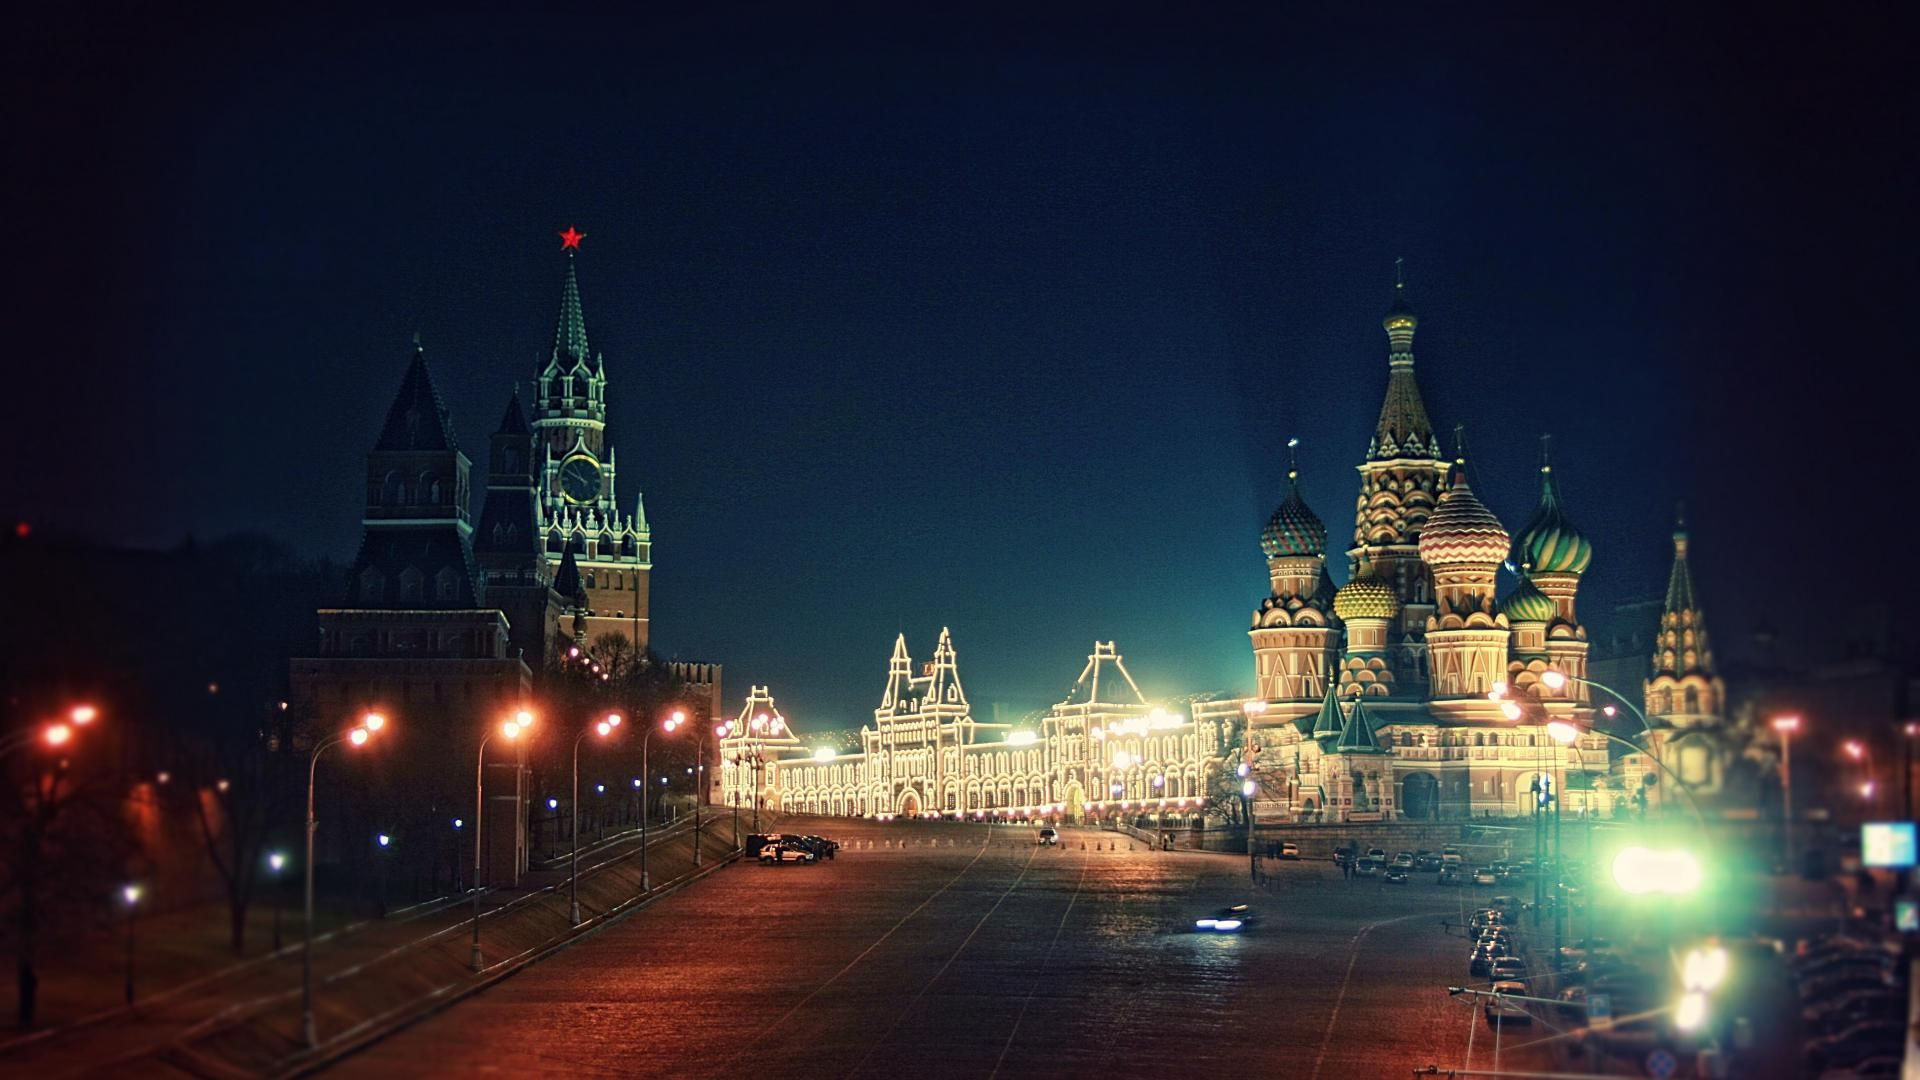 Moscow Wallpapers Wallpaper 1024 768 Moscow Wallpapers 31 Wallpapers Adorable Wallpapers World Mobile World Images Samsung Wallpaper